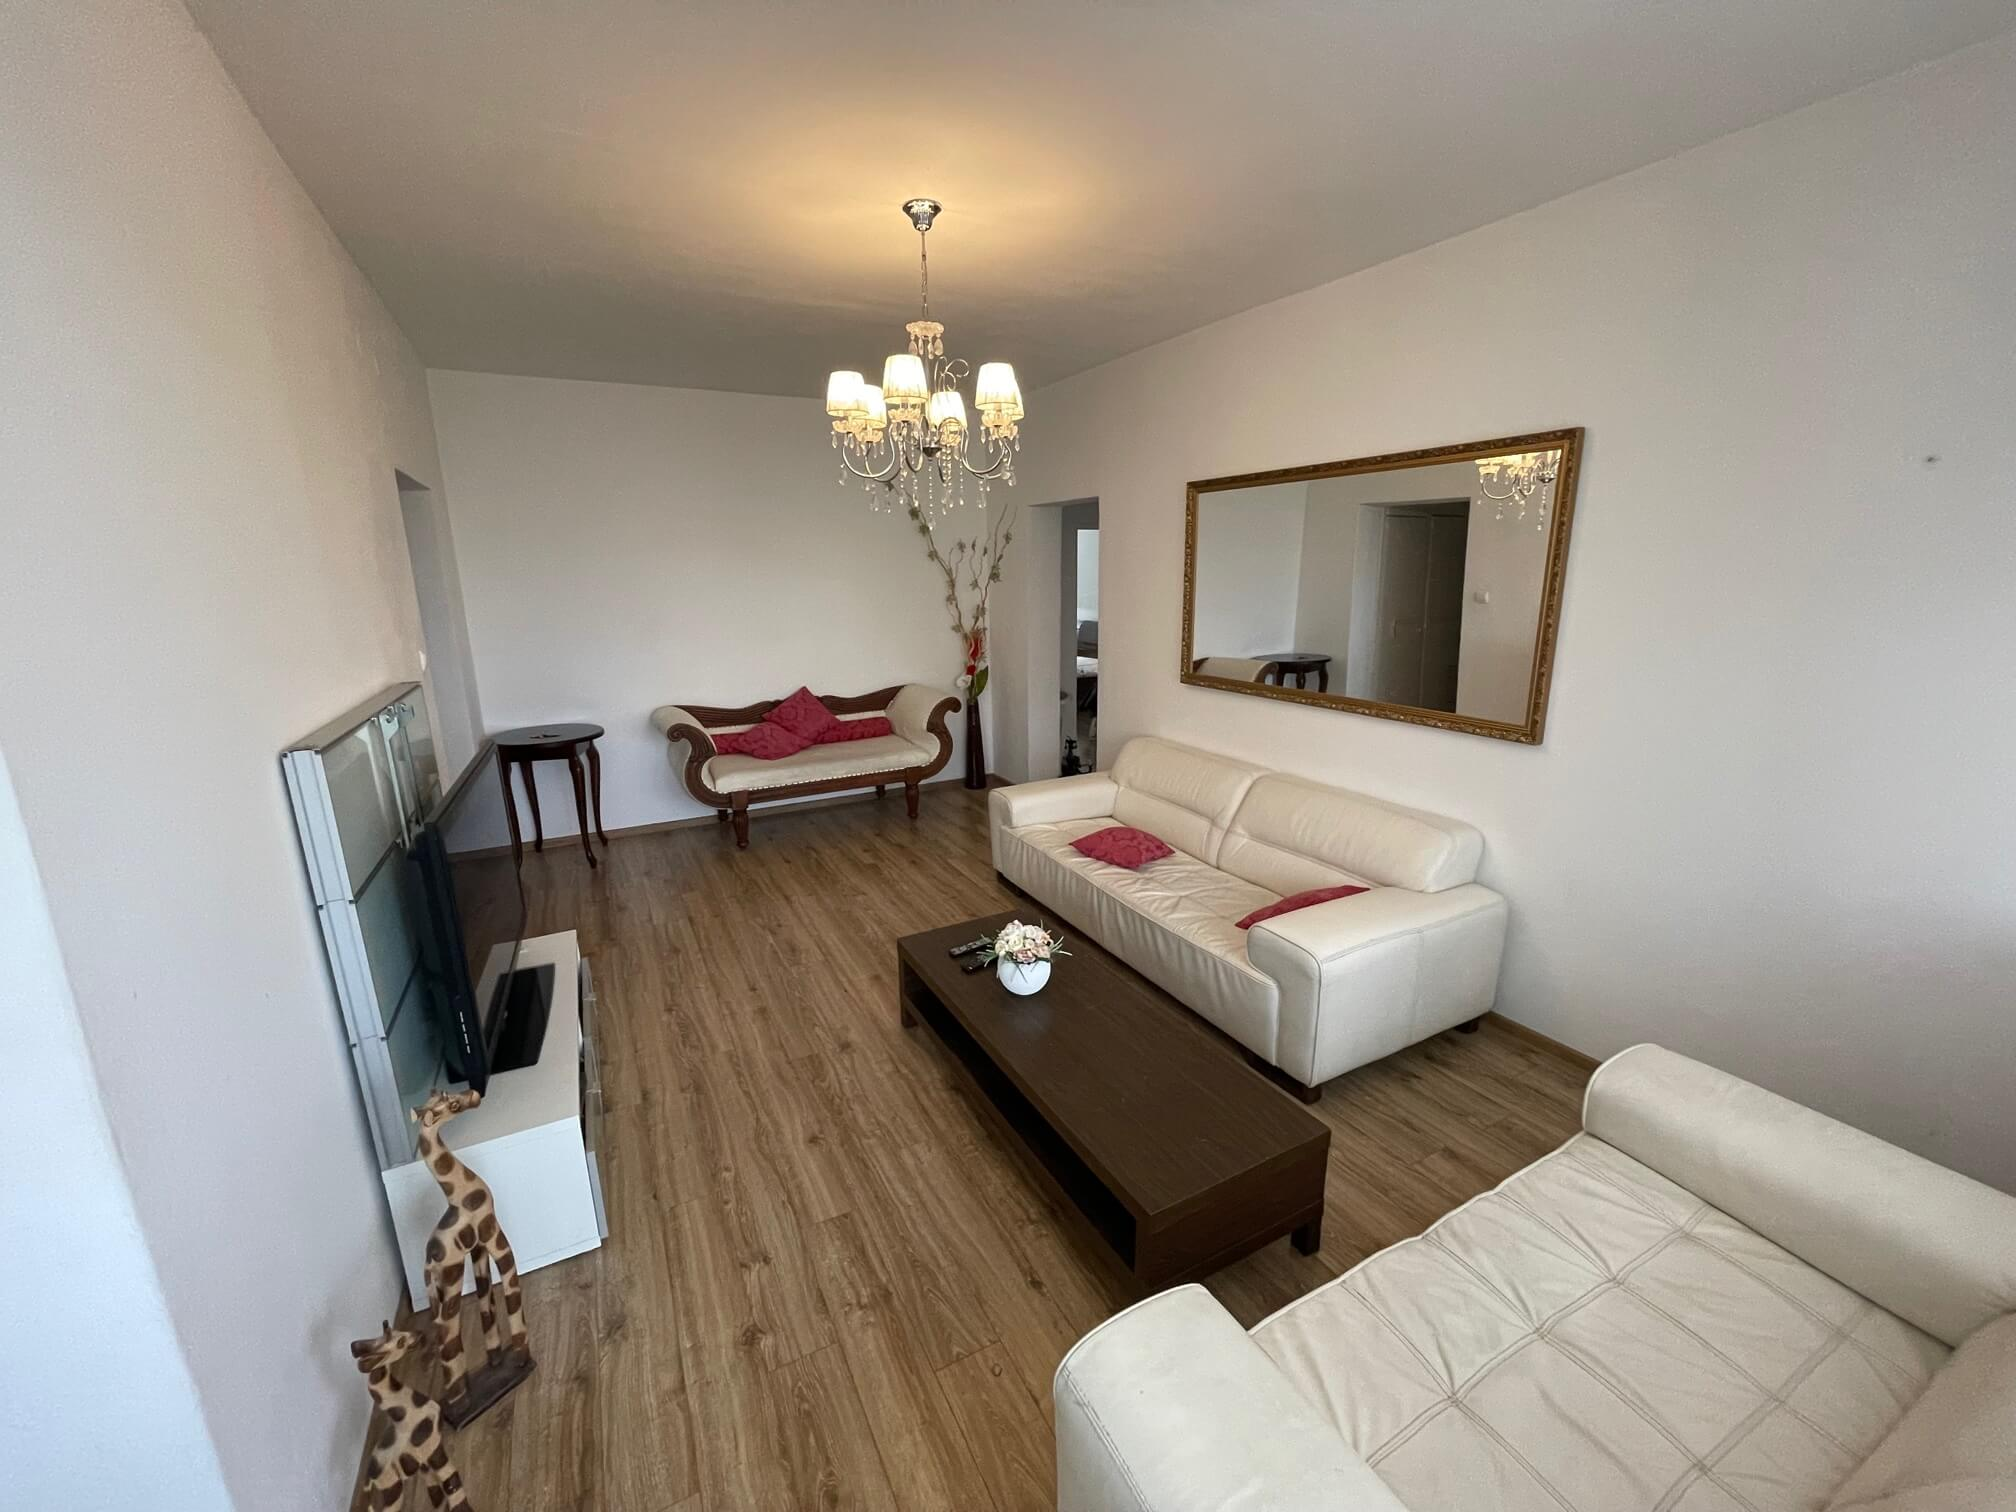 Exkluzívne na prenájom 3 izbový byt, 83m2, 2x loggia 4,5m2, Karolovka, Janotová 8-22